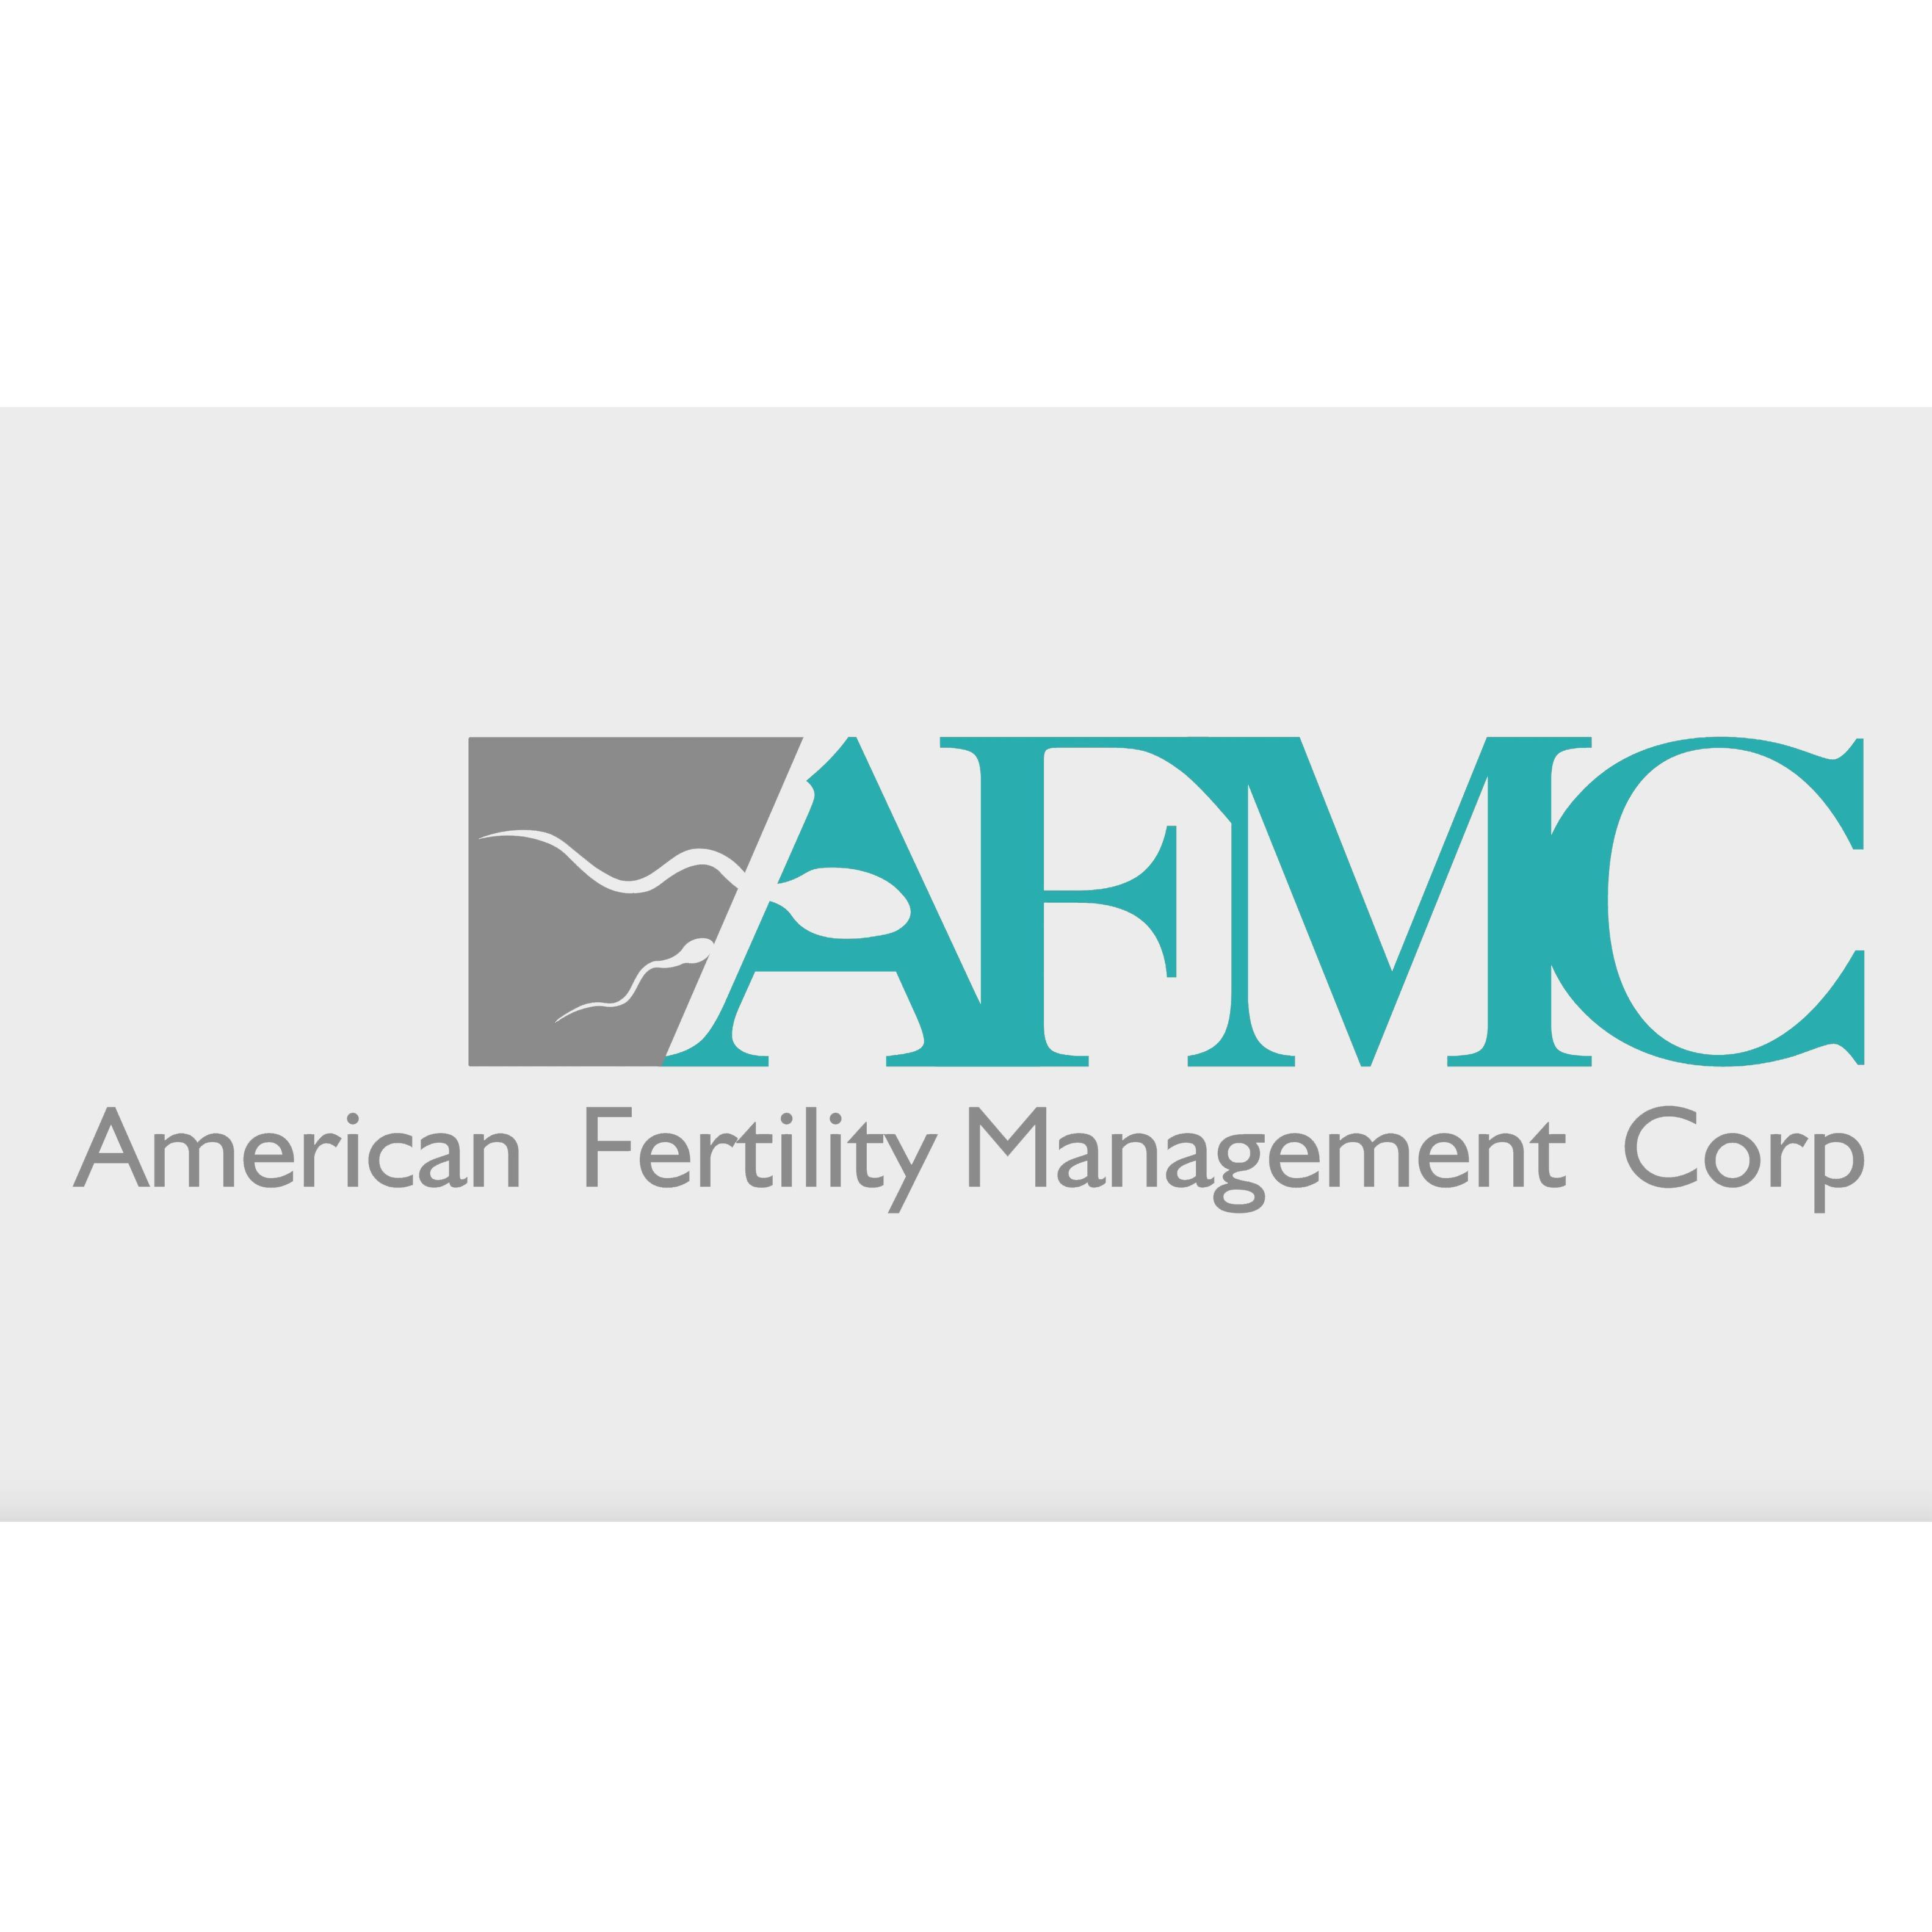 American Fertility Management Corp.